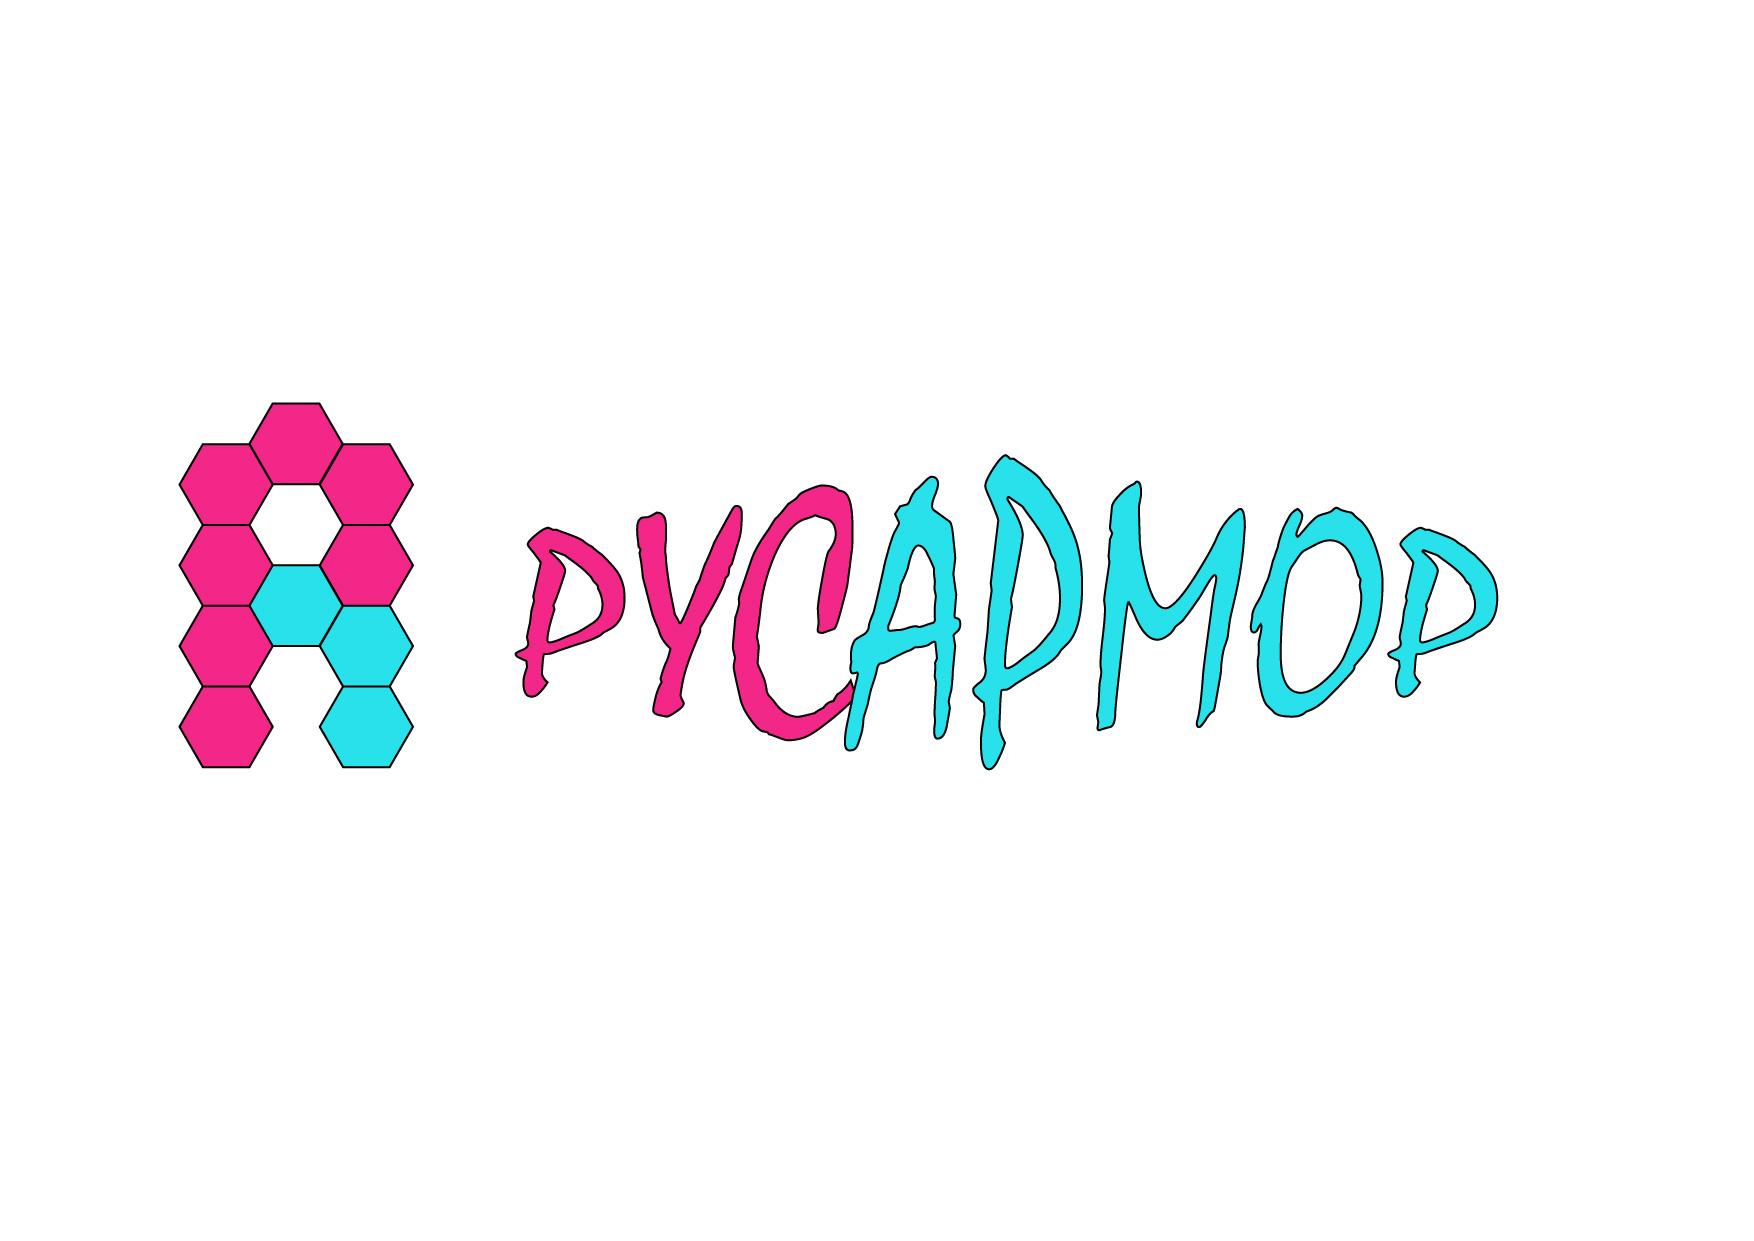 Разработка логотипа технологического стартапа РУСАРМОР фото f_4515a0d500452134.jpg